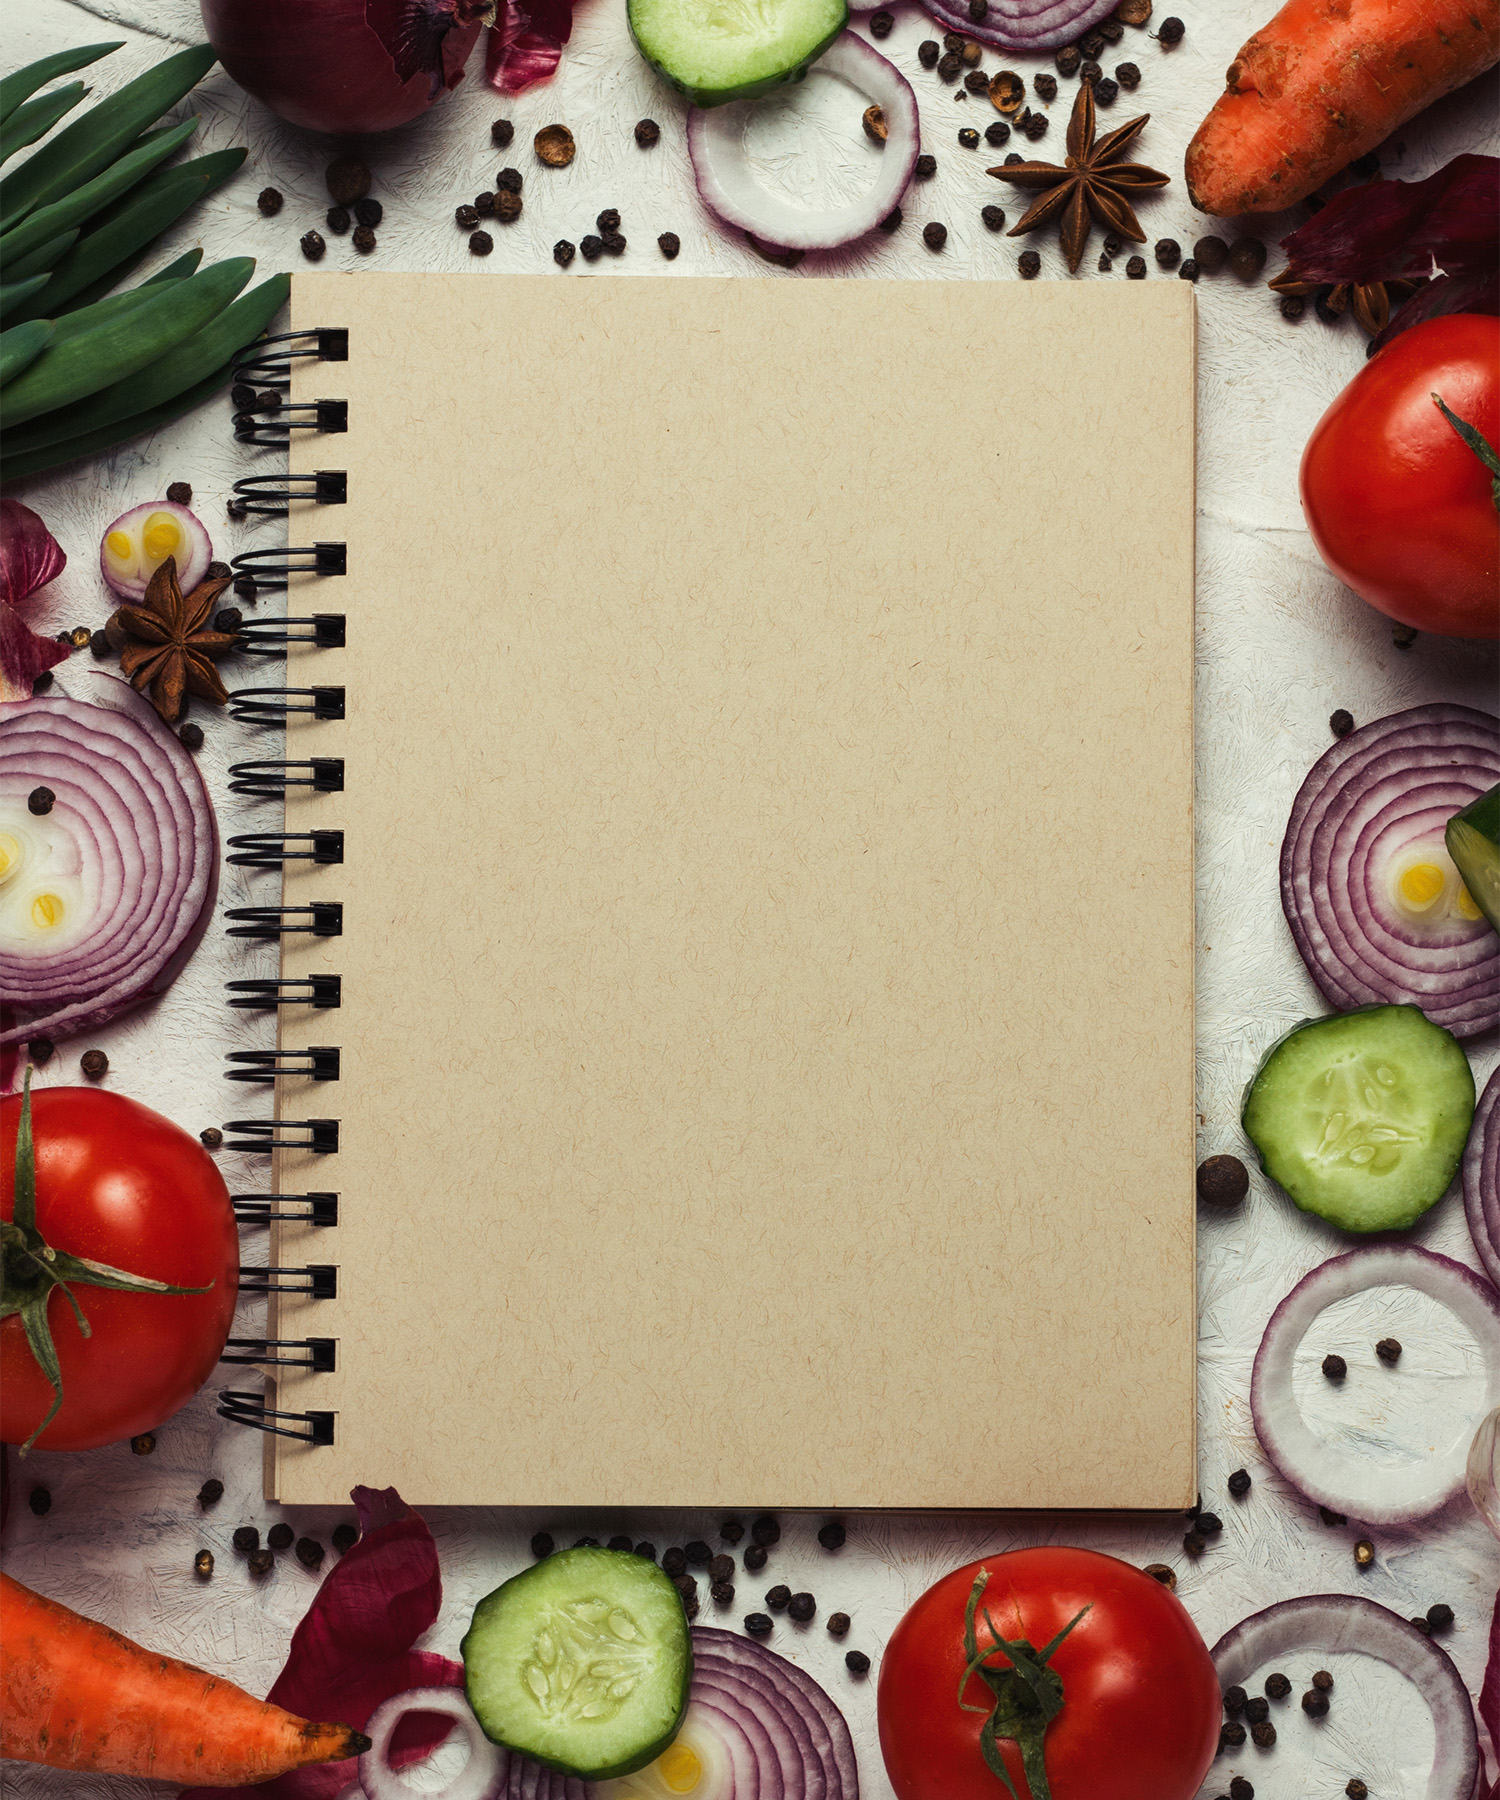 Detox Notebook